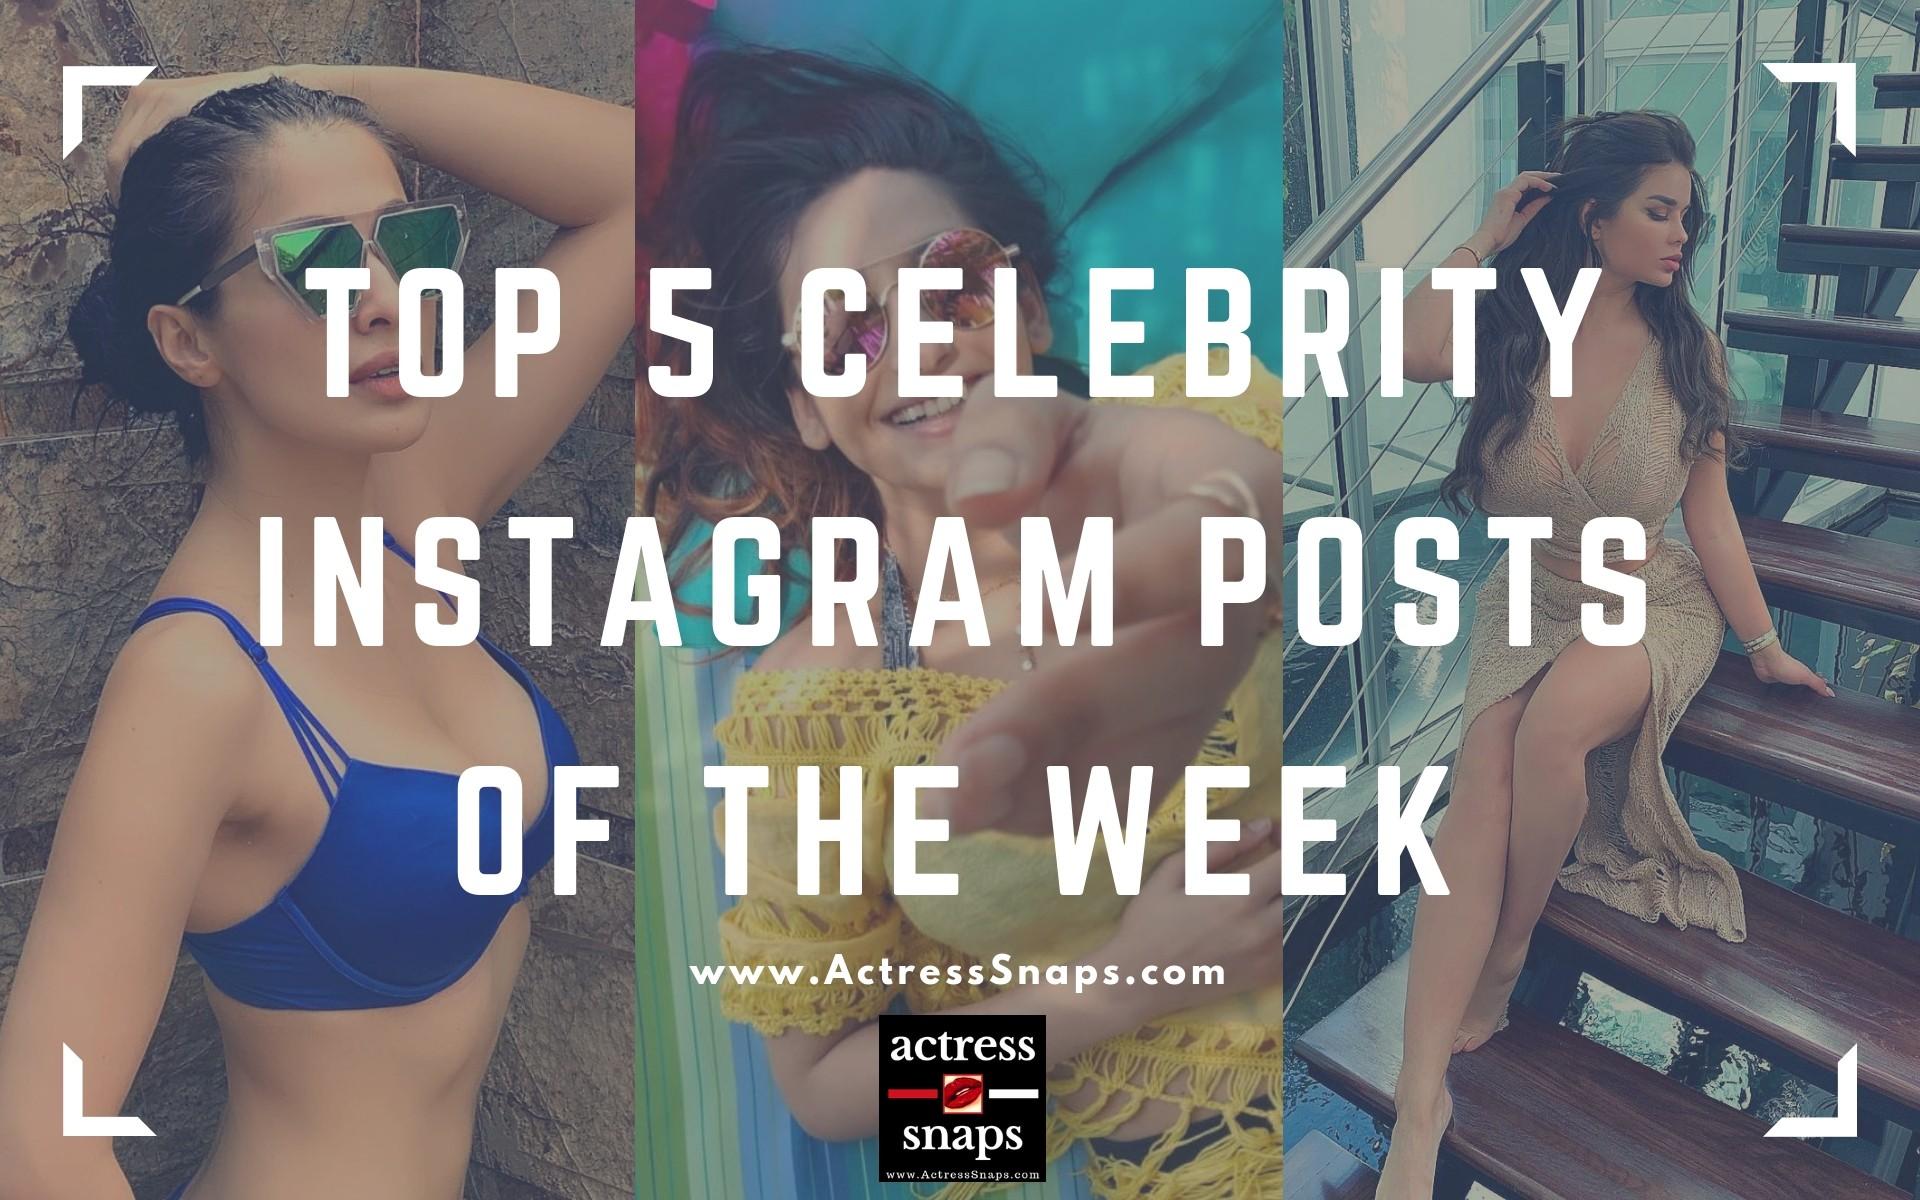 Trending Celebrity Instagram Pics of the Week #LakshmiRai #RaginiDwivedi #AnastasiyaKvitko #SaraSampaio #KendraLust